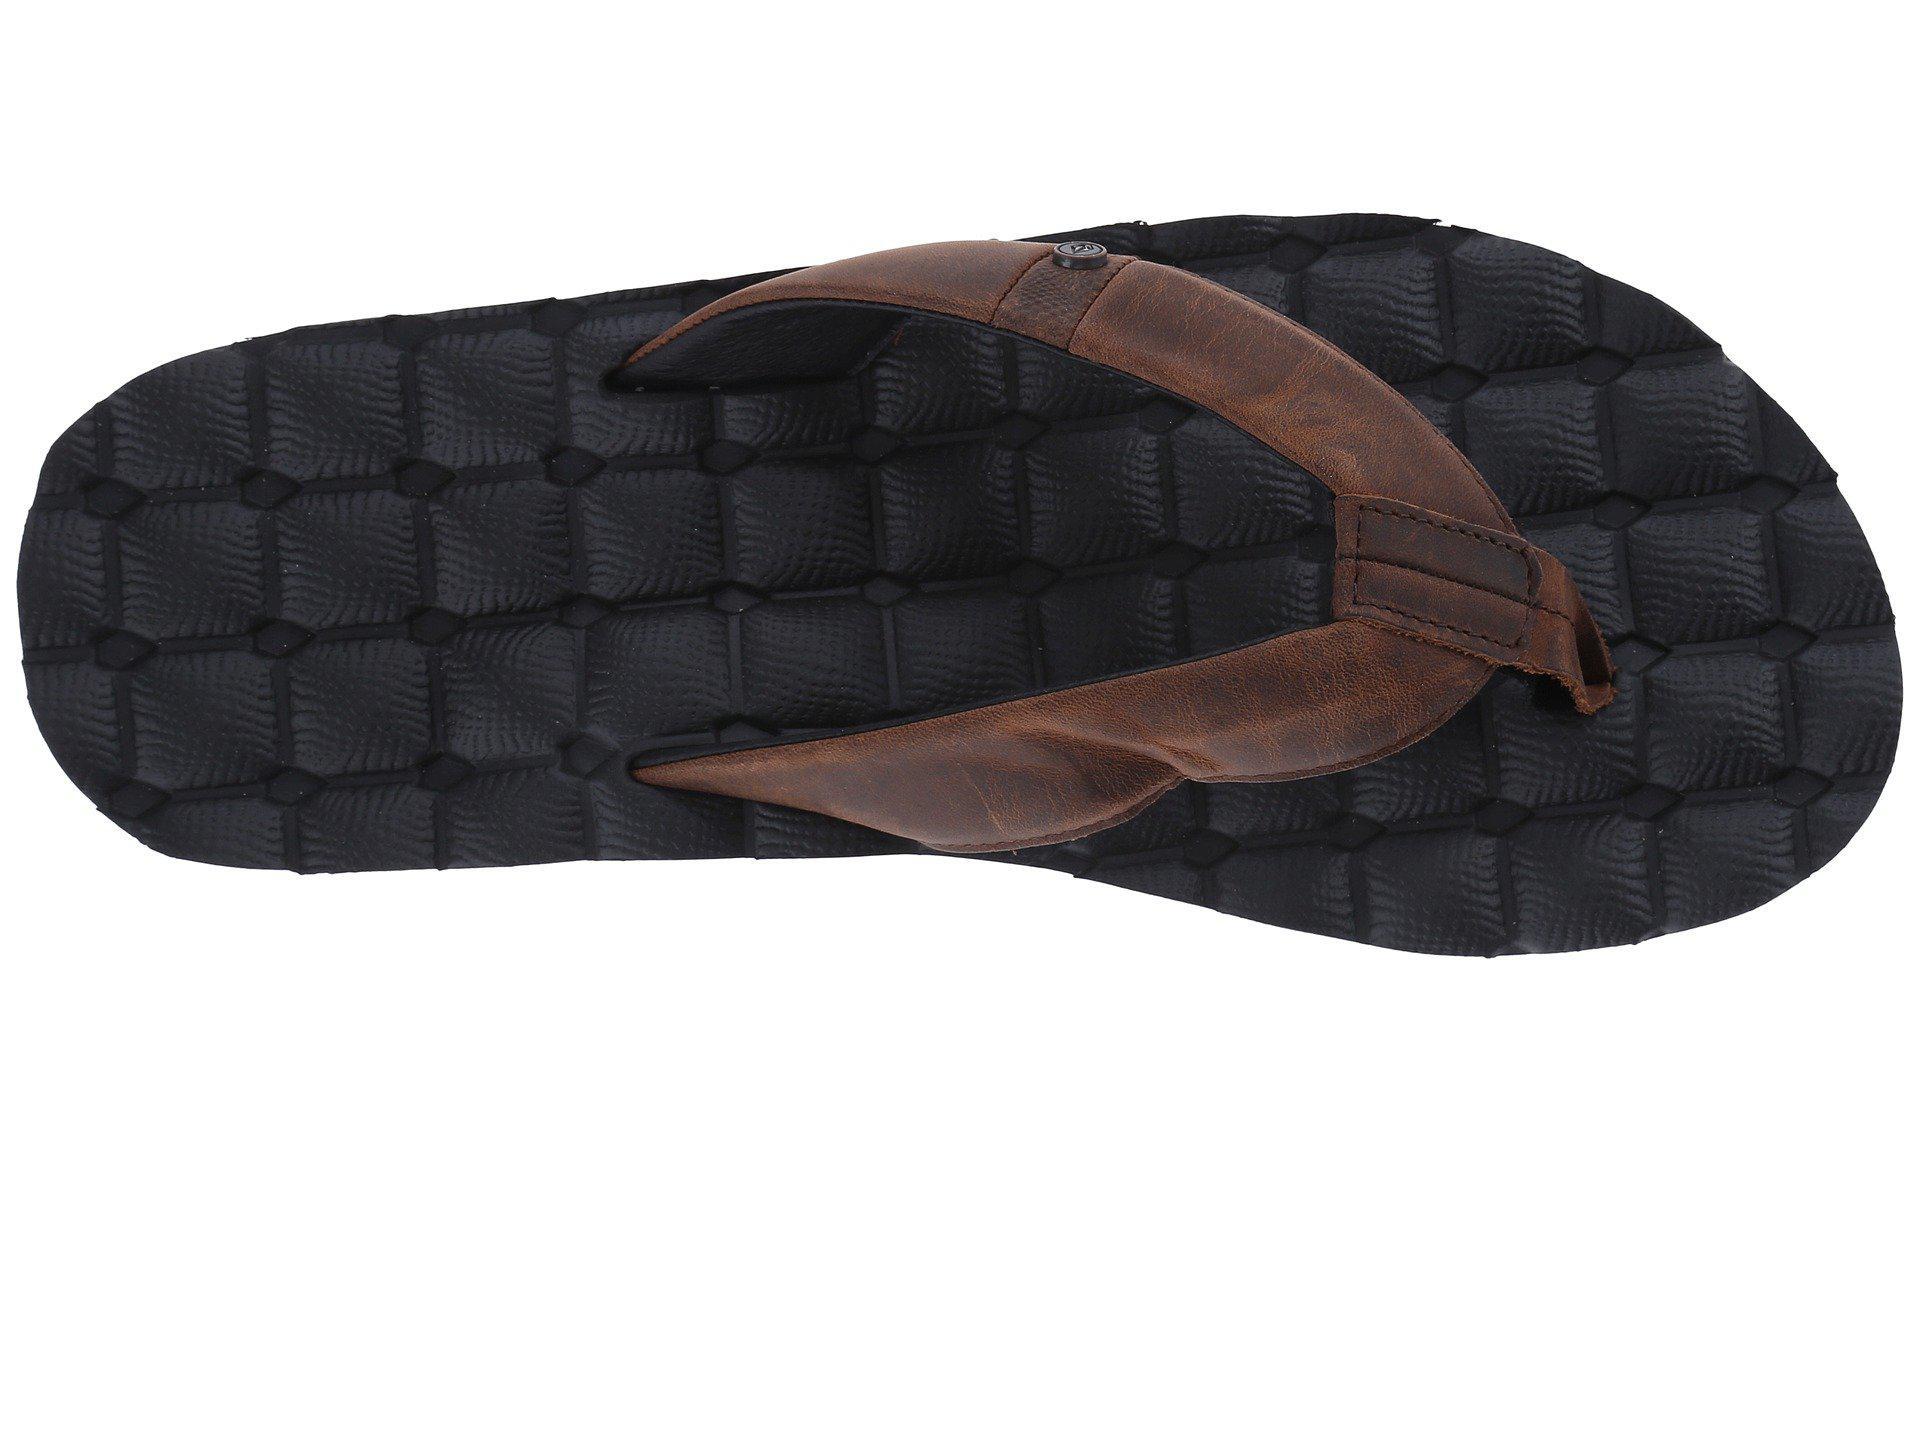 96484622f64a Volcom - Recliner Leather (vintage Brown) Men s Sandals for Men - Lyst.  View fullscreen